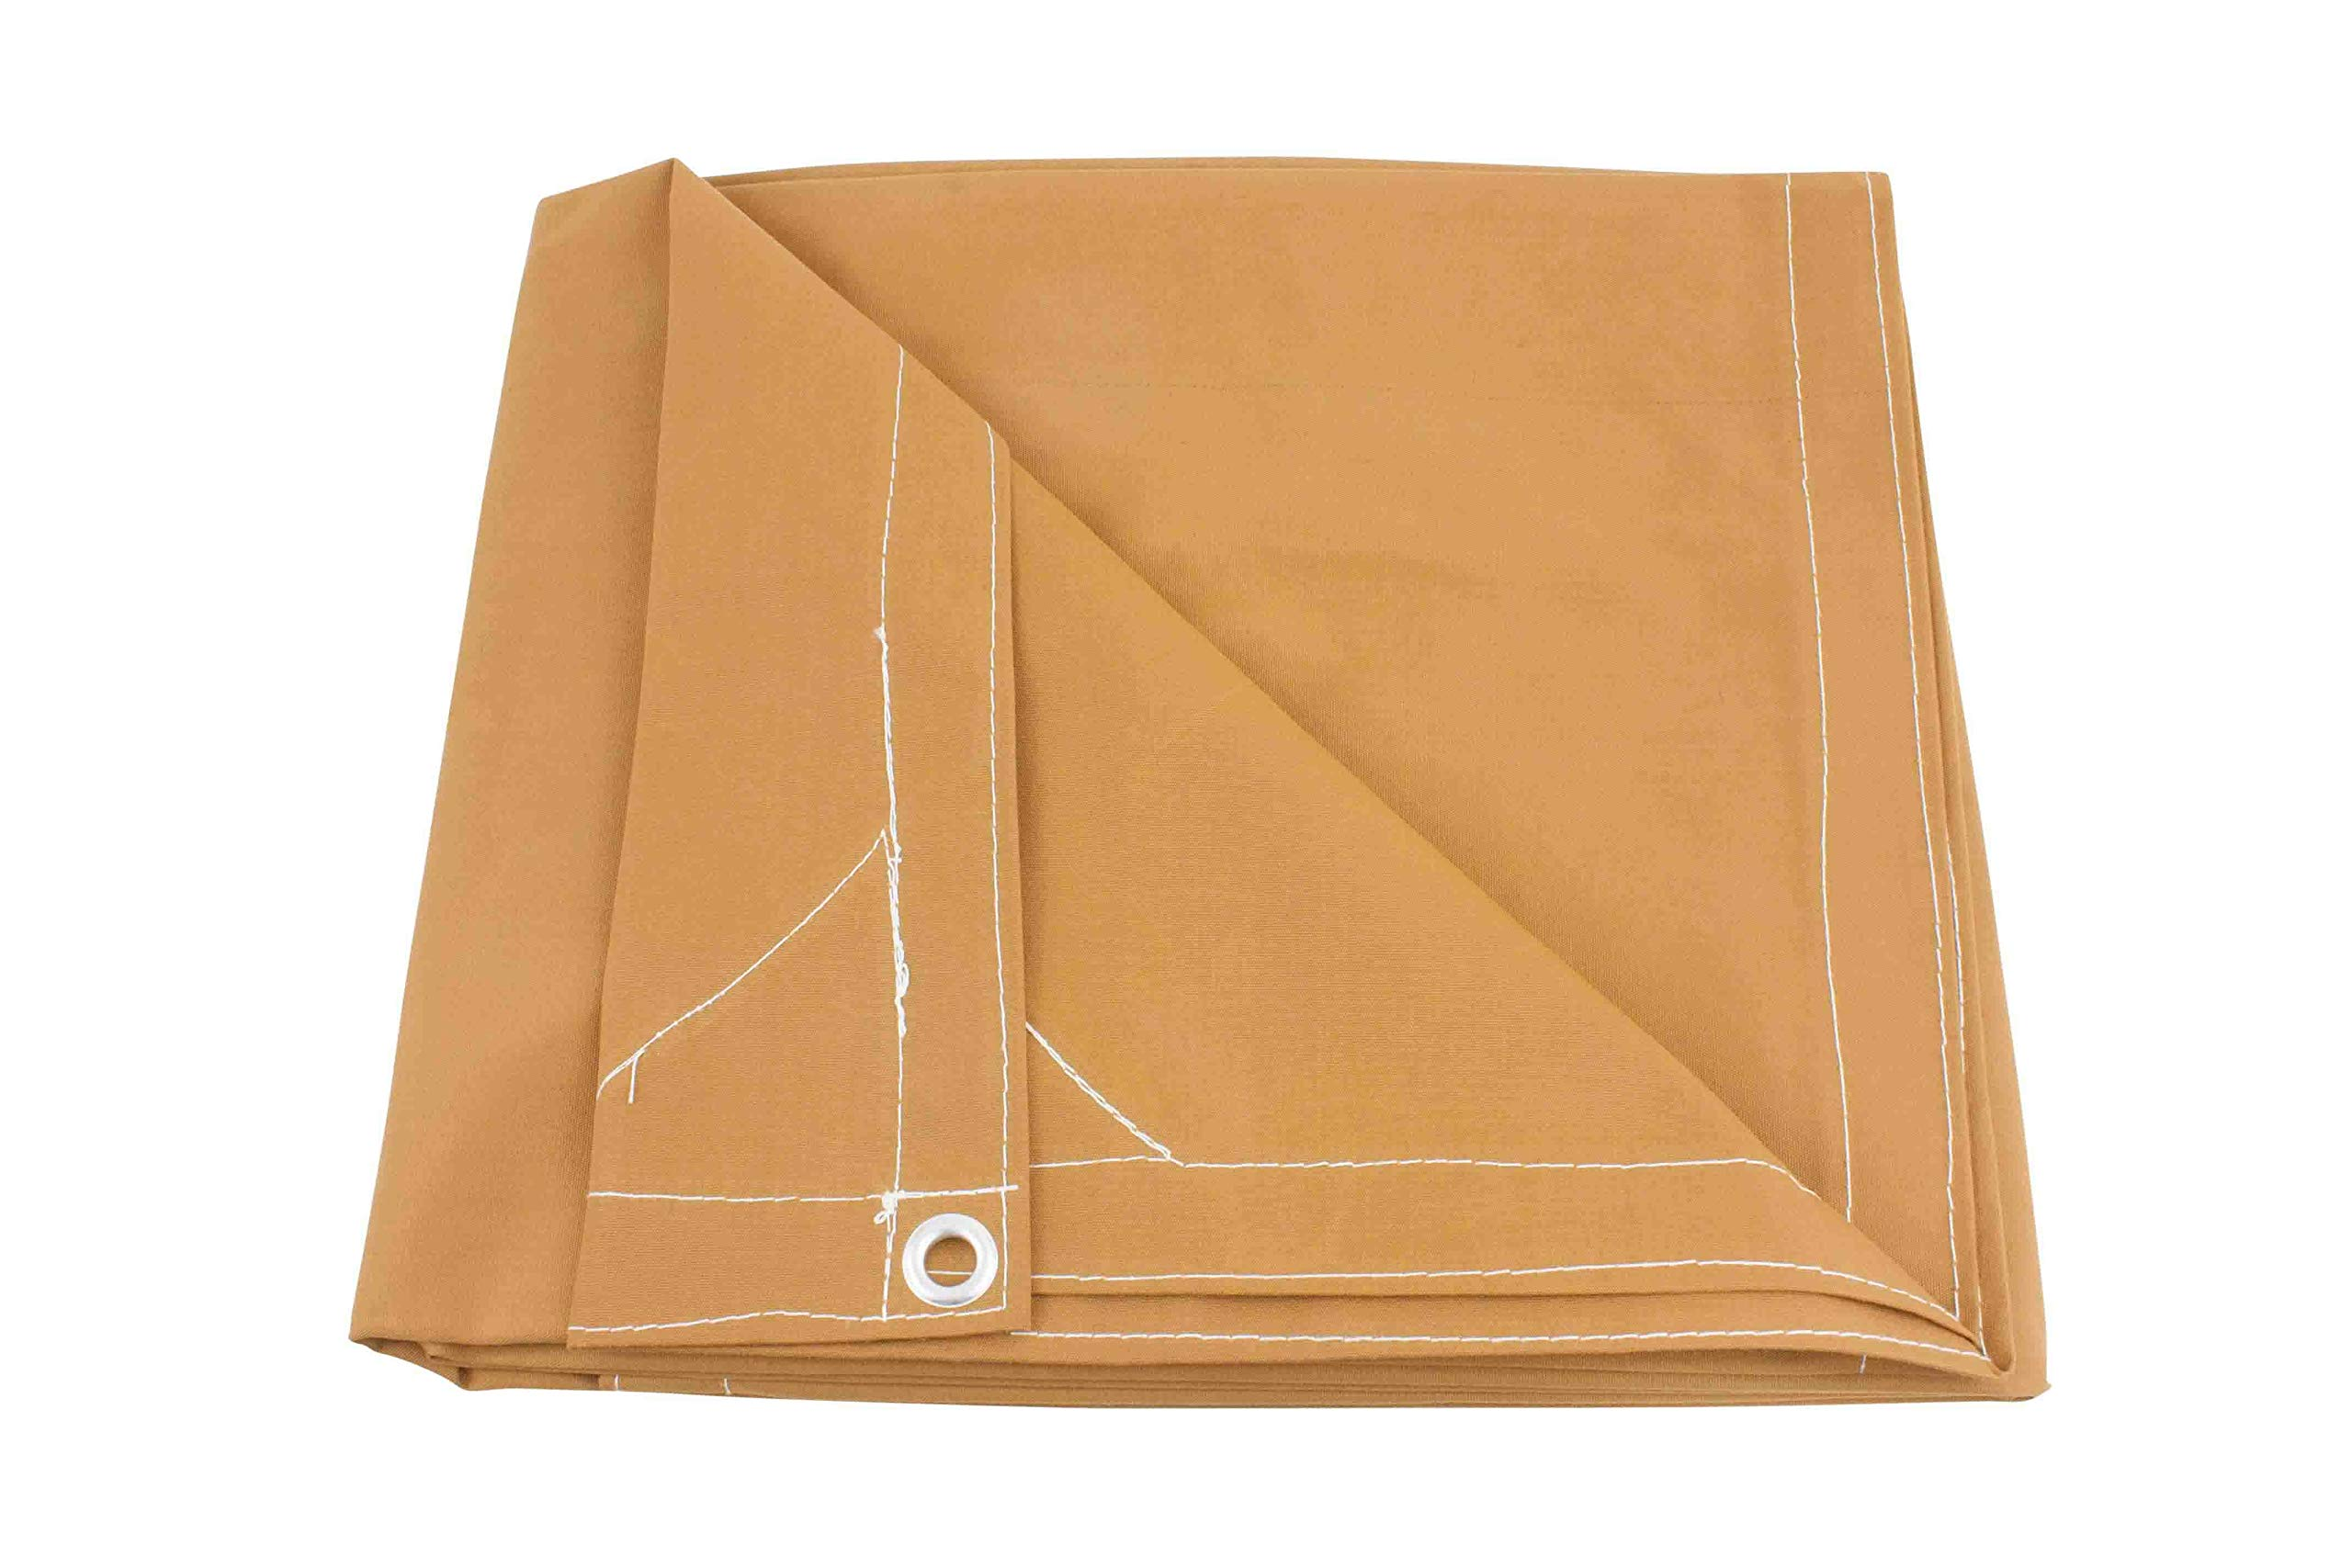 20' x 40' Tan Canvas Tarp 12oz Heavy Duty Water Resistant by Mytee (Image #1)